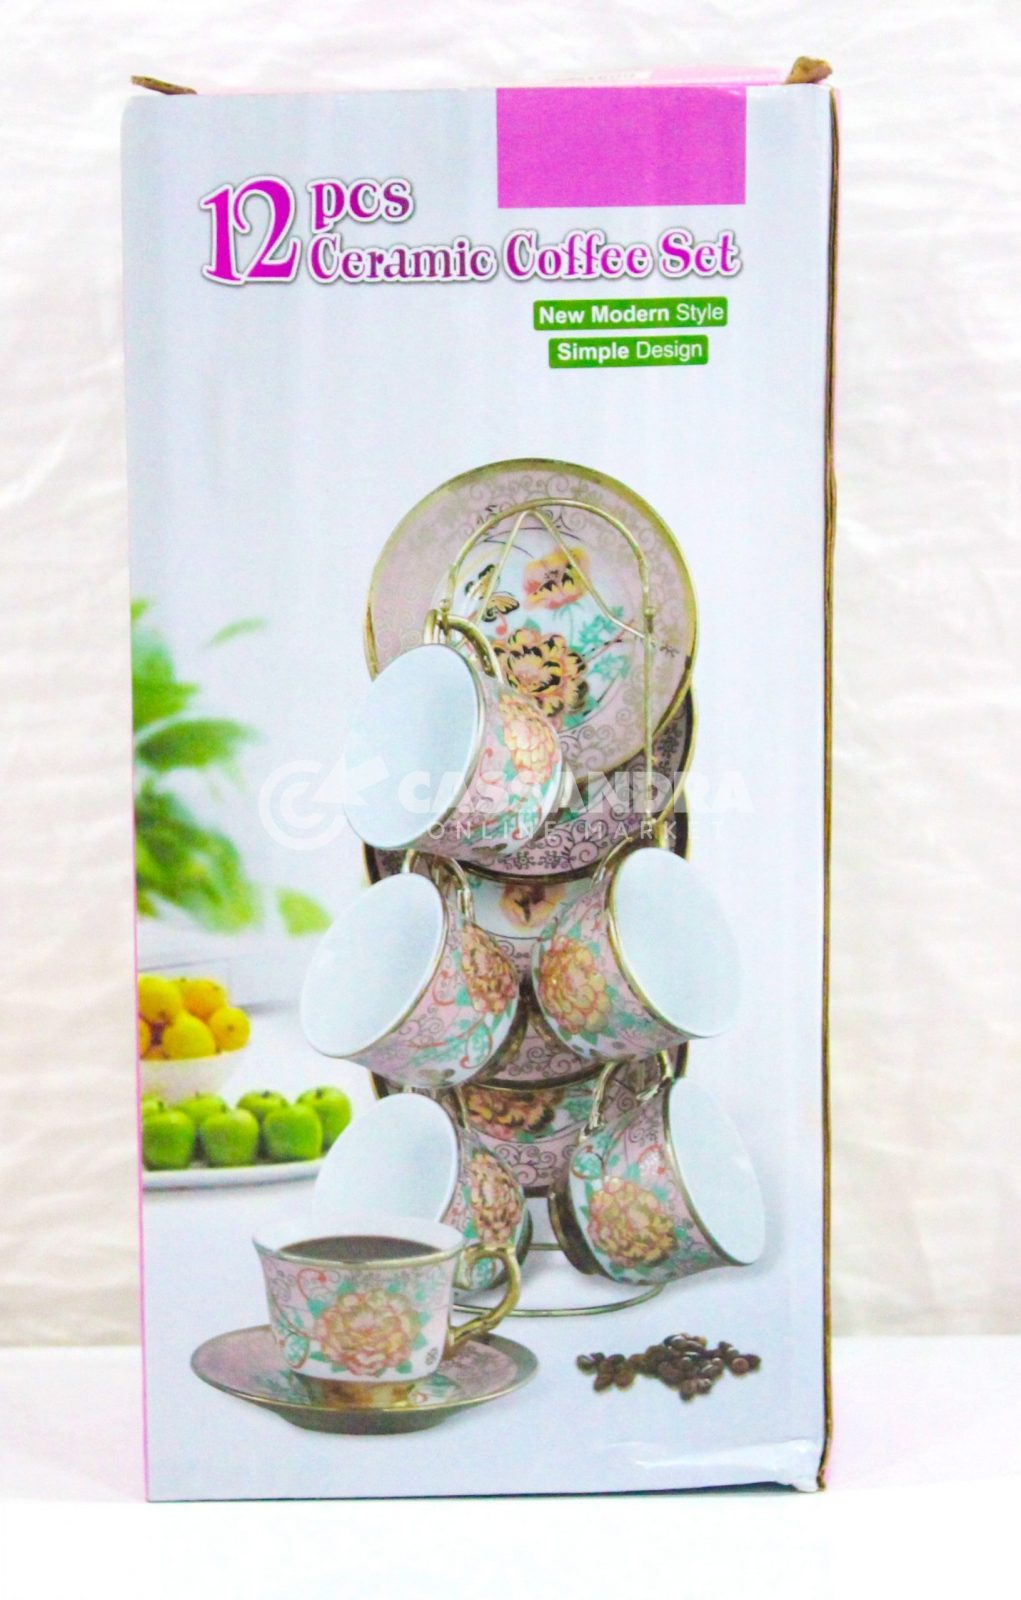 12 pcs ceramic coffee set new modern style simple design